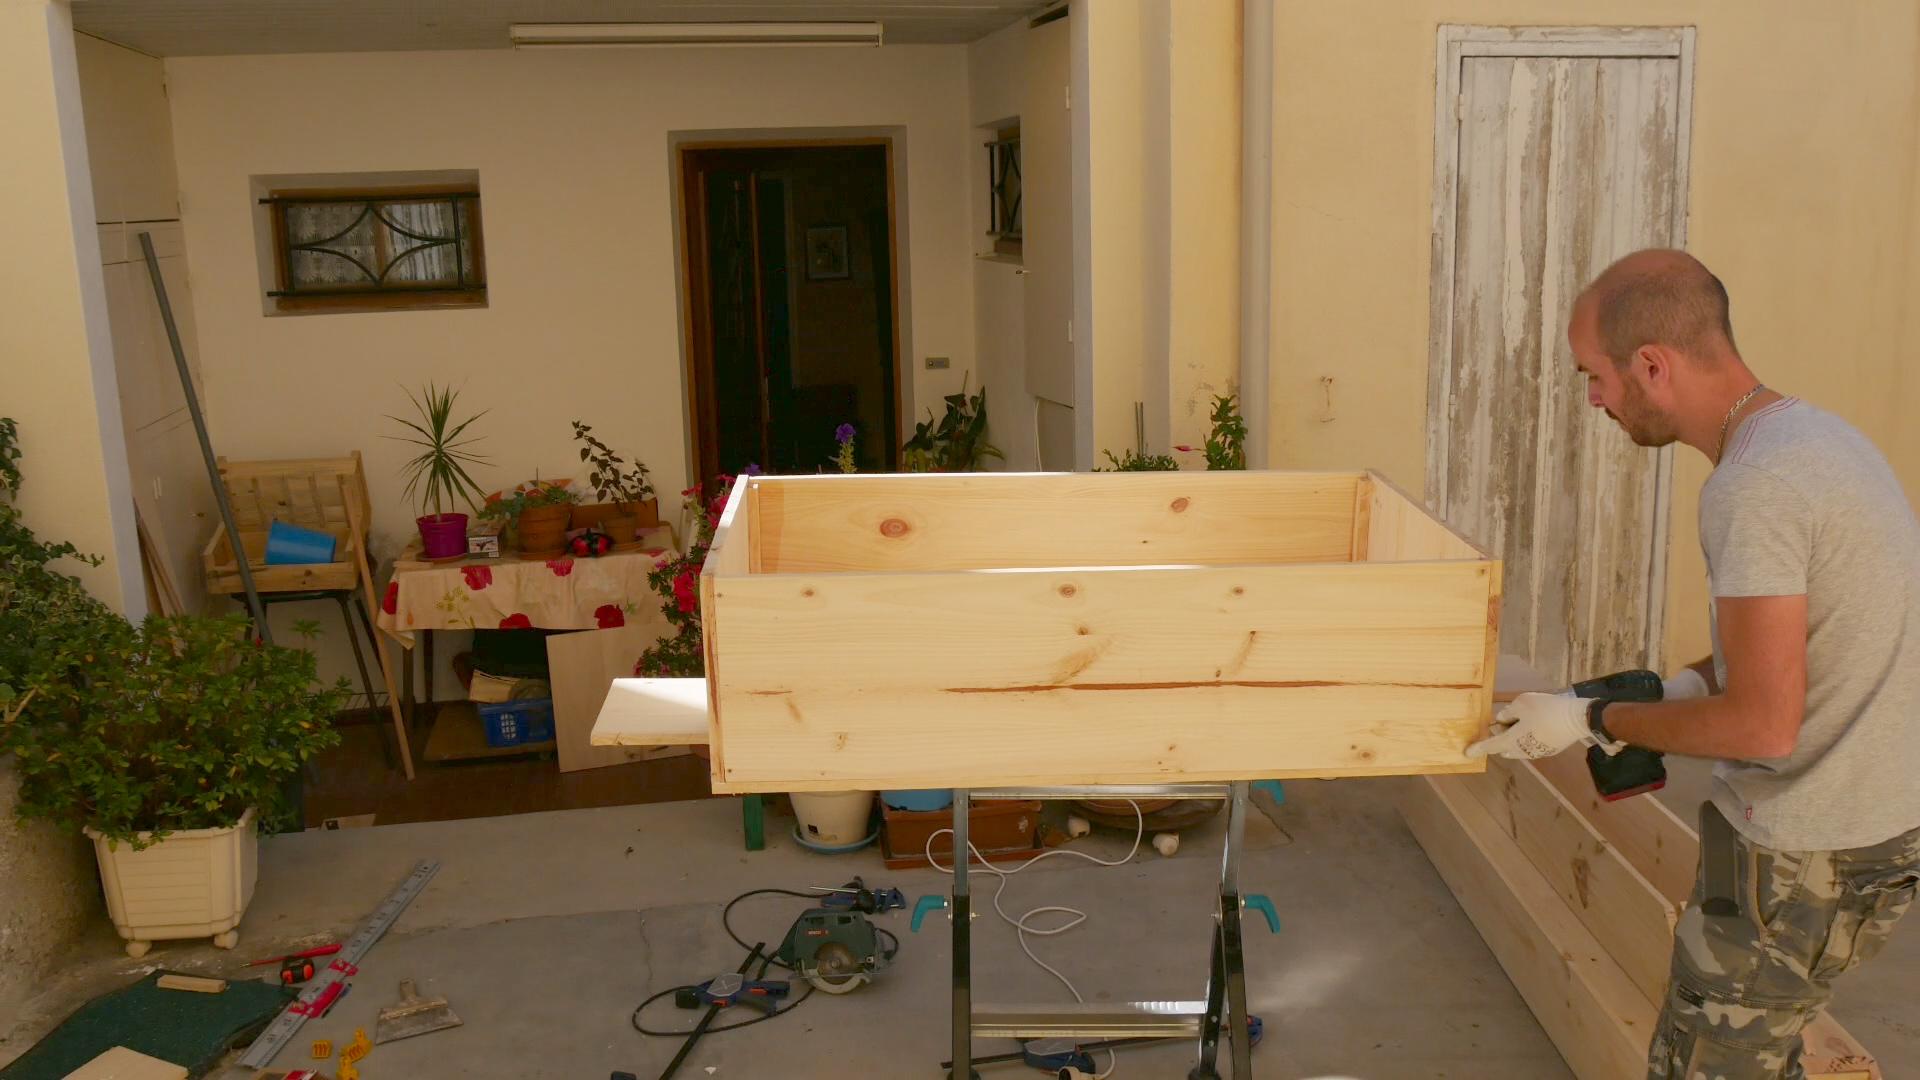 rg arche4 retroetgeek. Black Bedroom Furniture Sets. Home Design Ideas